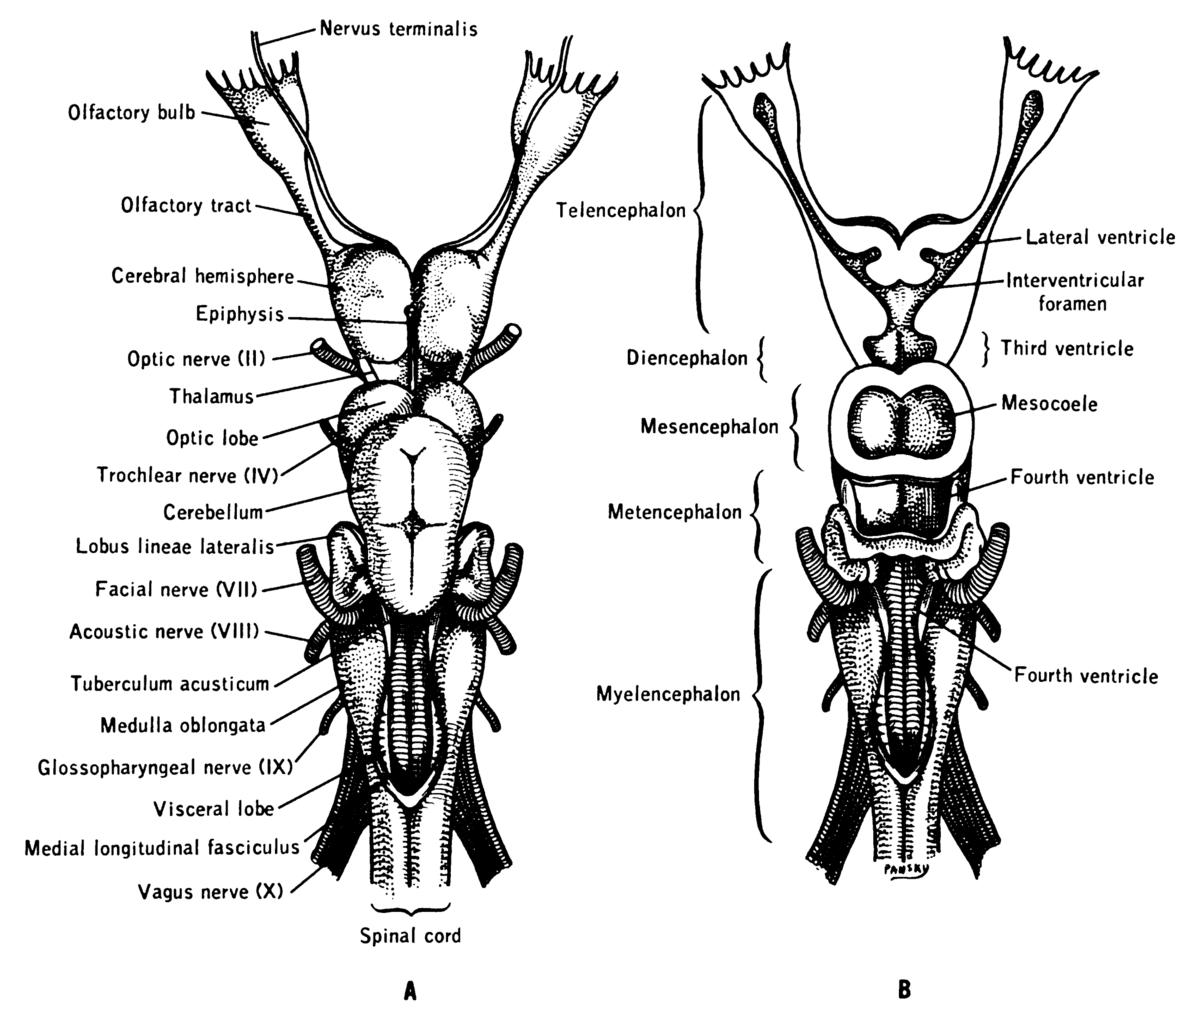 nervus terminalis cranial nerve 0